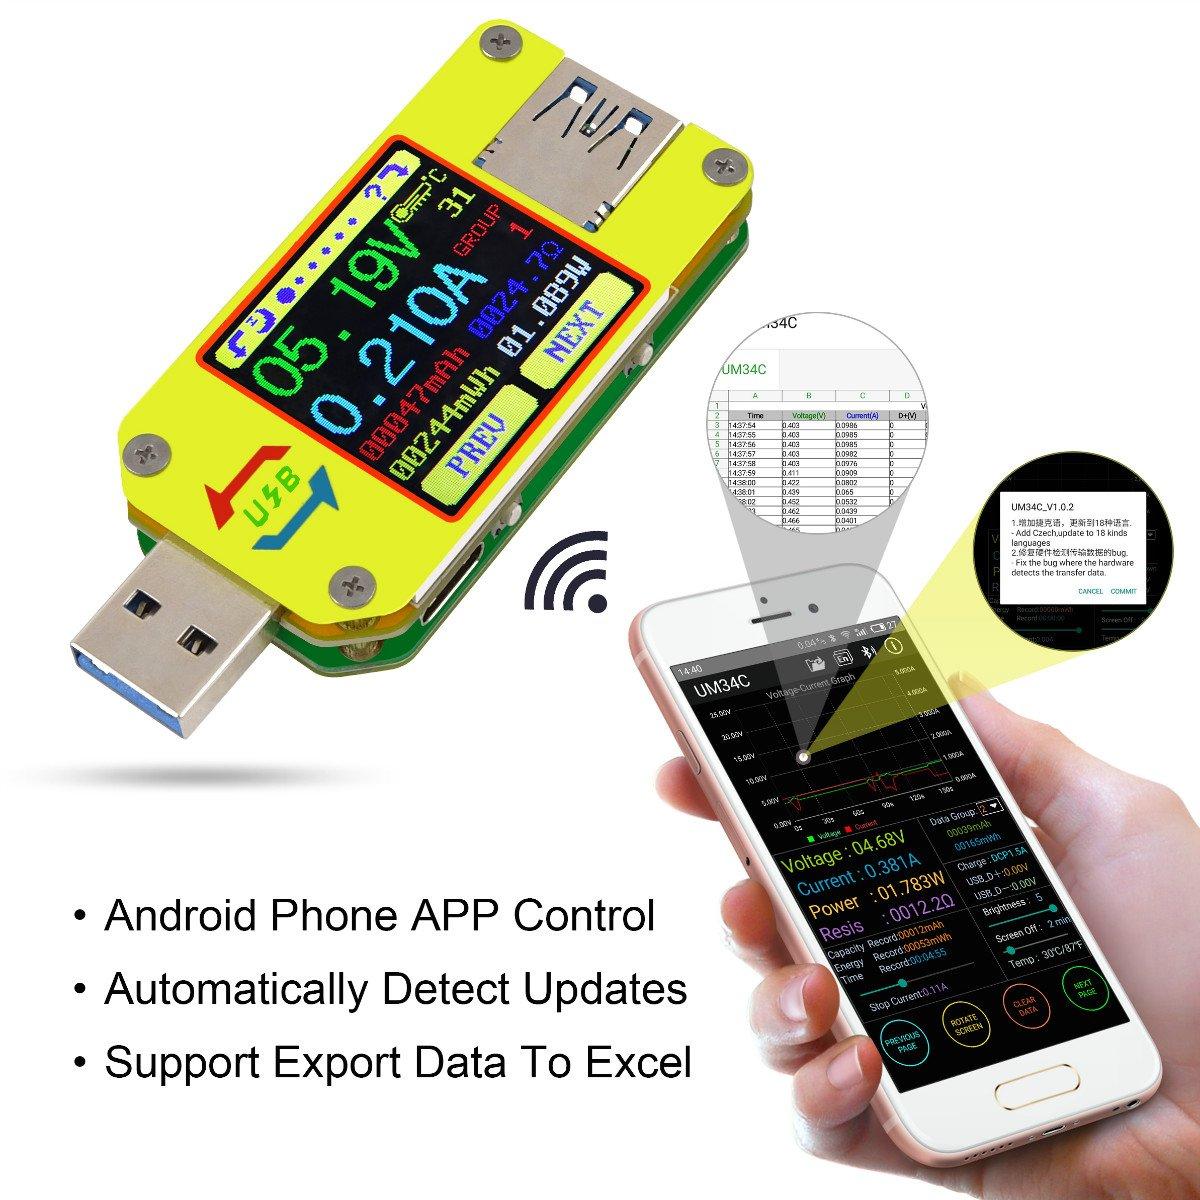 MakerHawk UM34C USB Meter Tester Voltage Current Bluetooth Battery Power Charger Voltmeter Ammeter Multimeter Tester, 1.44 Inch Color LCD Display USB 3.0 Type- C Cable Resistance Load Impedance Meter